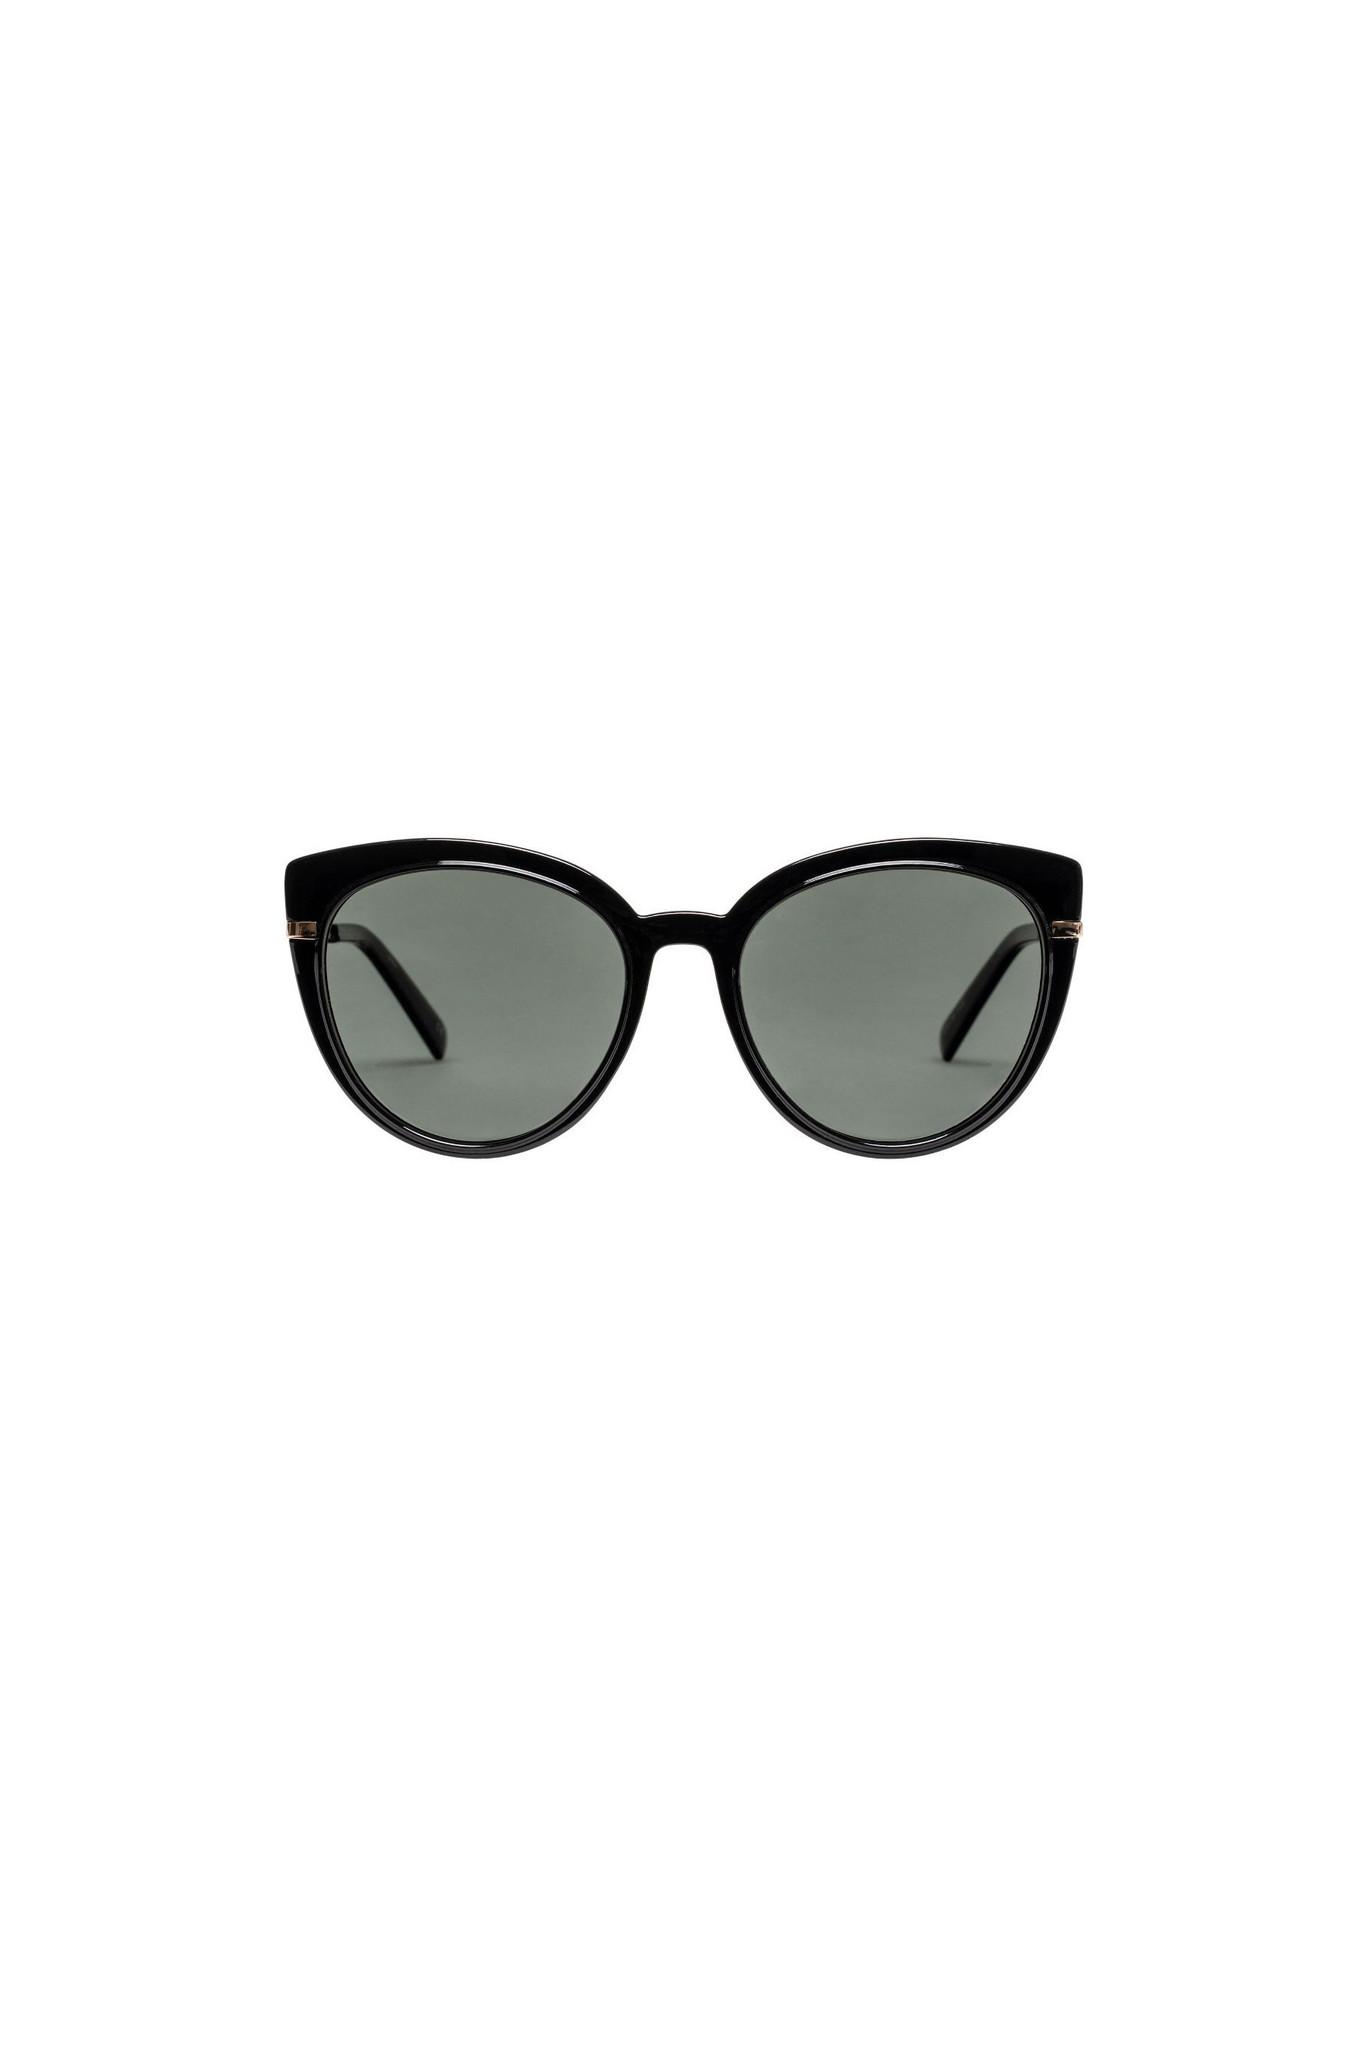 Promiscuous *Polarized* Sunglasses - Black-1